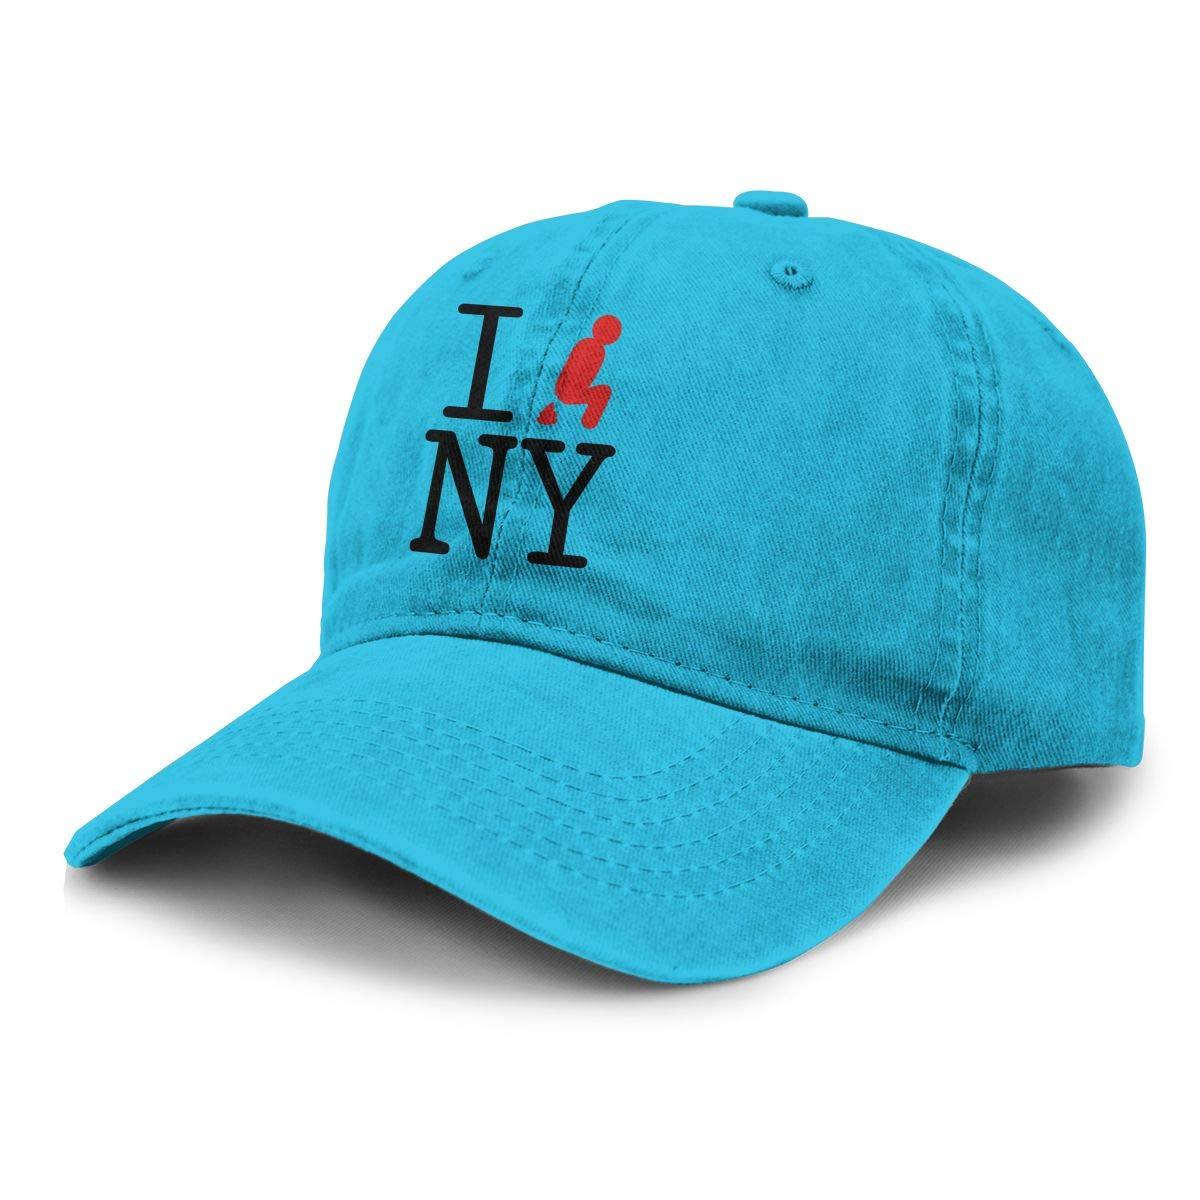 Gorra de béisbol Unisex para adultos I Shit On NY gorra de vaquero Snapback